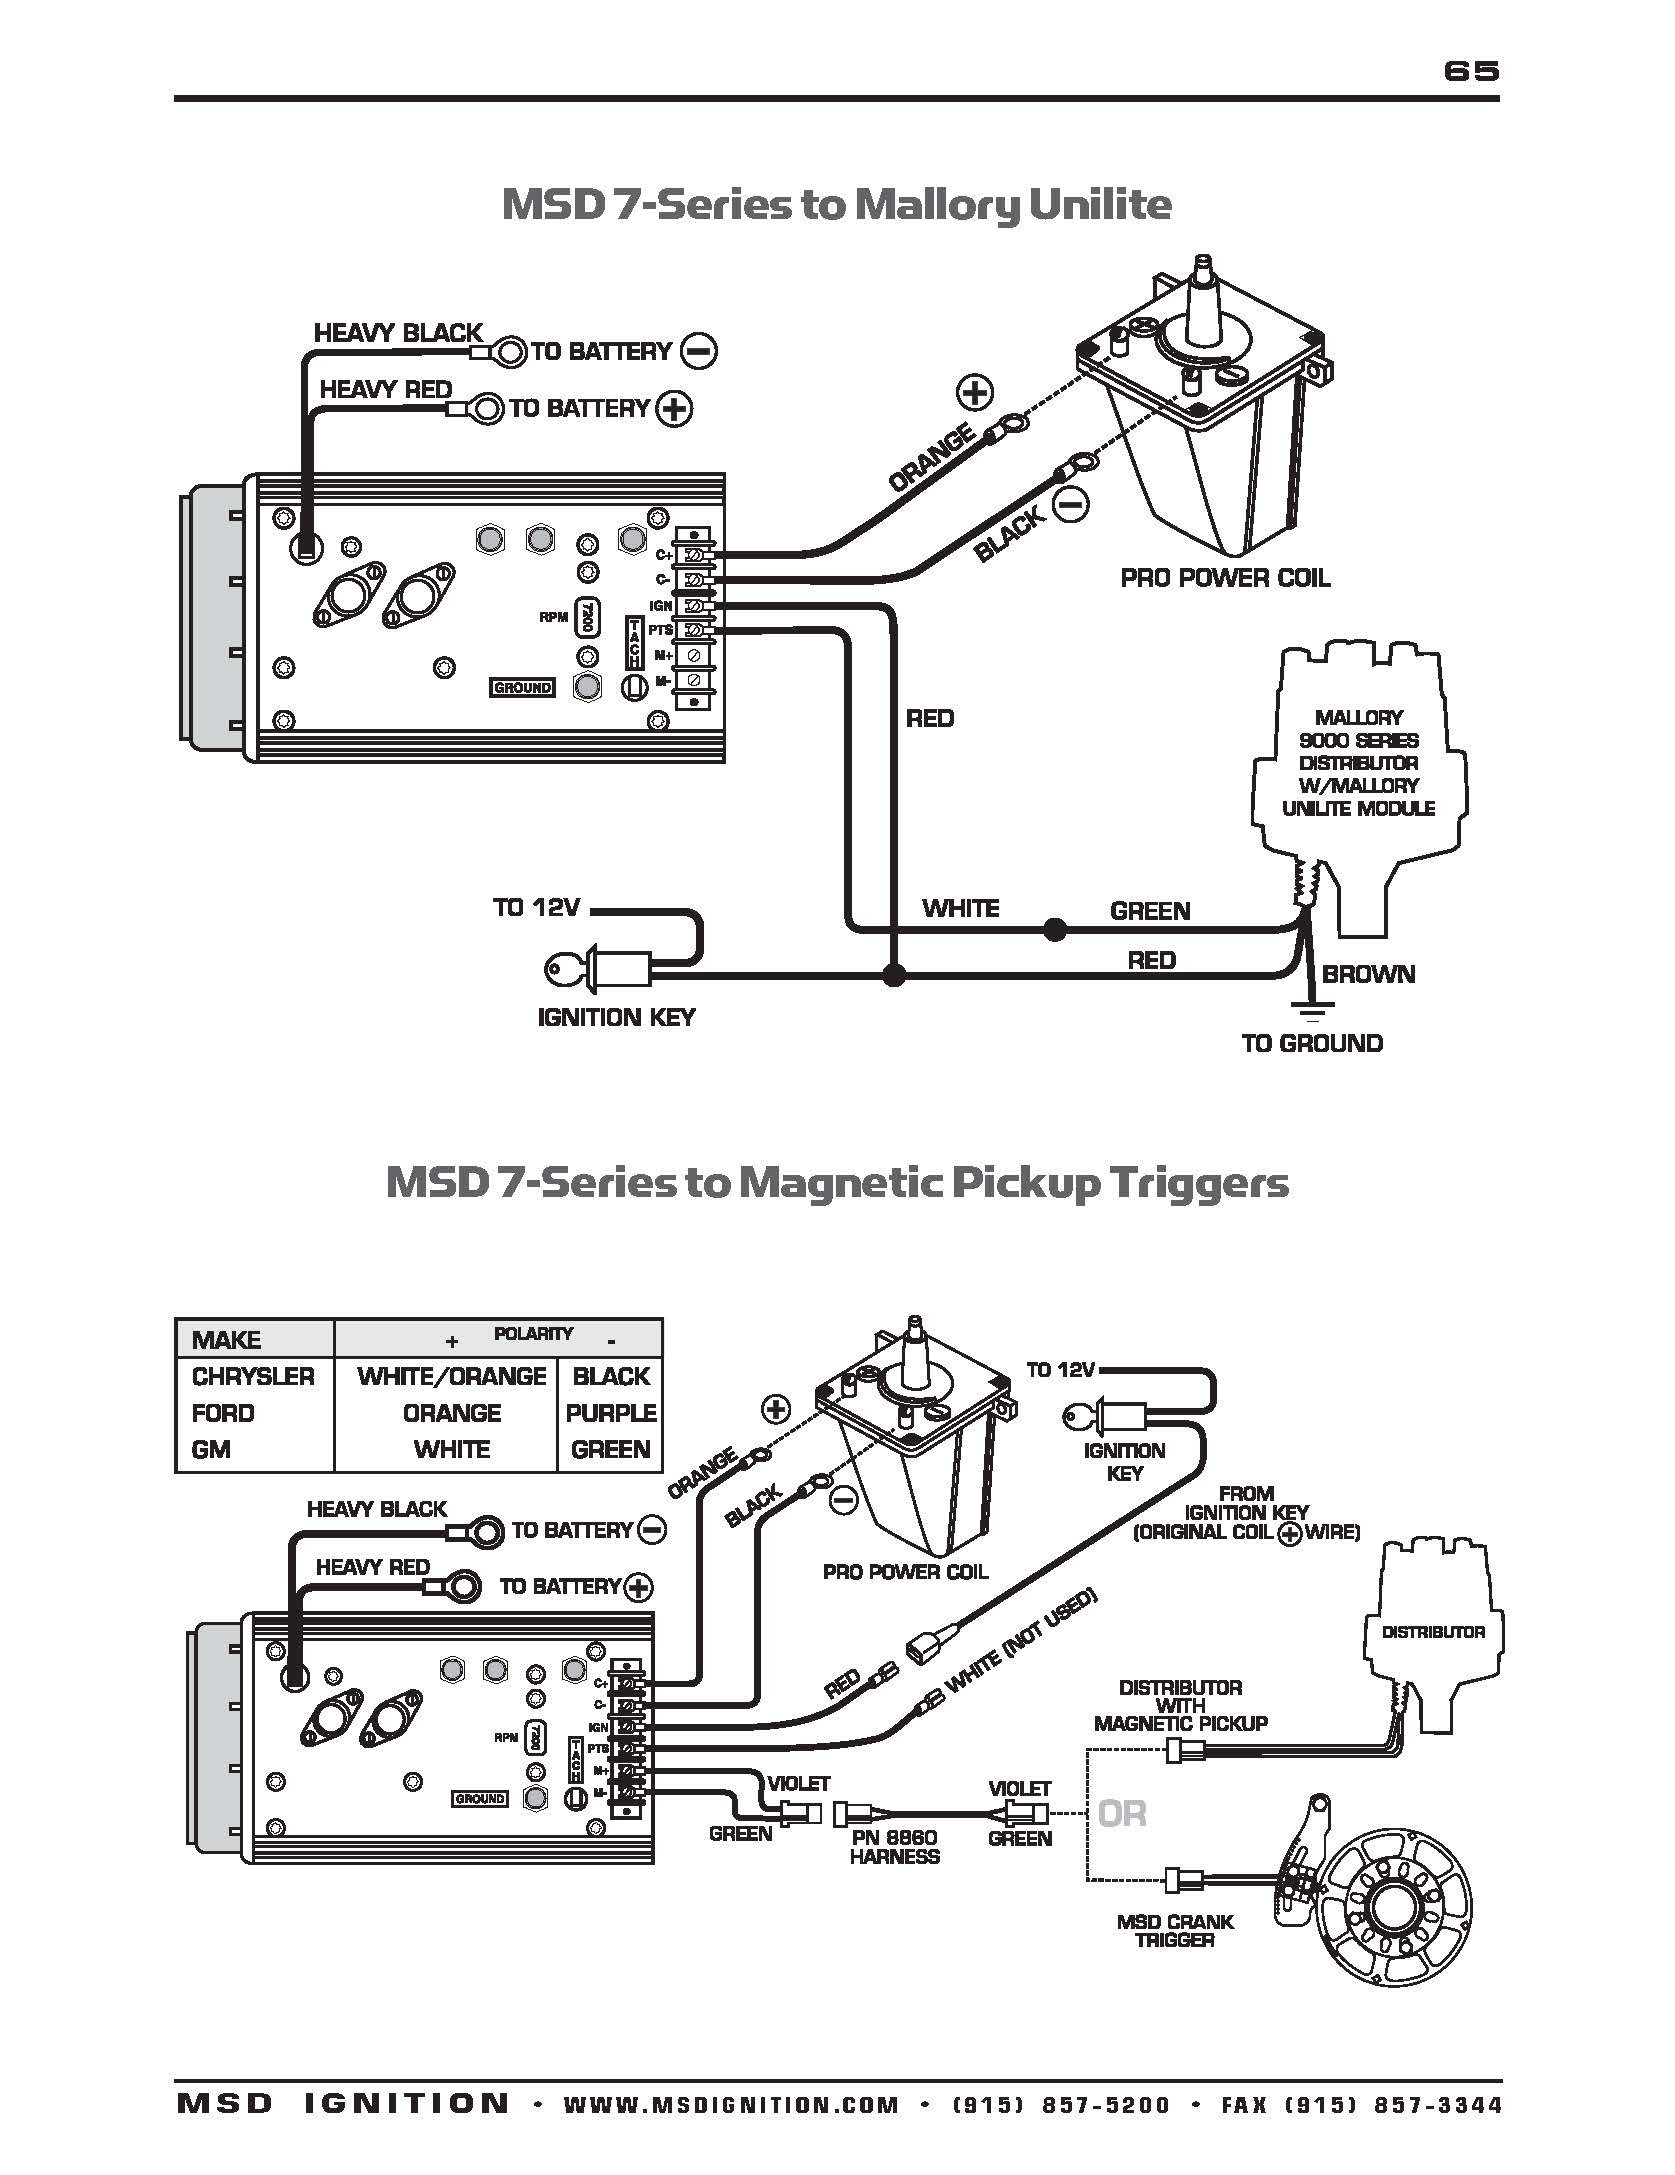 ignition coil distributor wiring diagram wdtn pn9615 page 064 in msd rh detoxicrecenze com MSD 6ALN 6430 Wiring-Diagram MSD Ford Wiring Diagrams